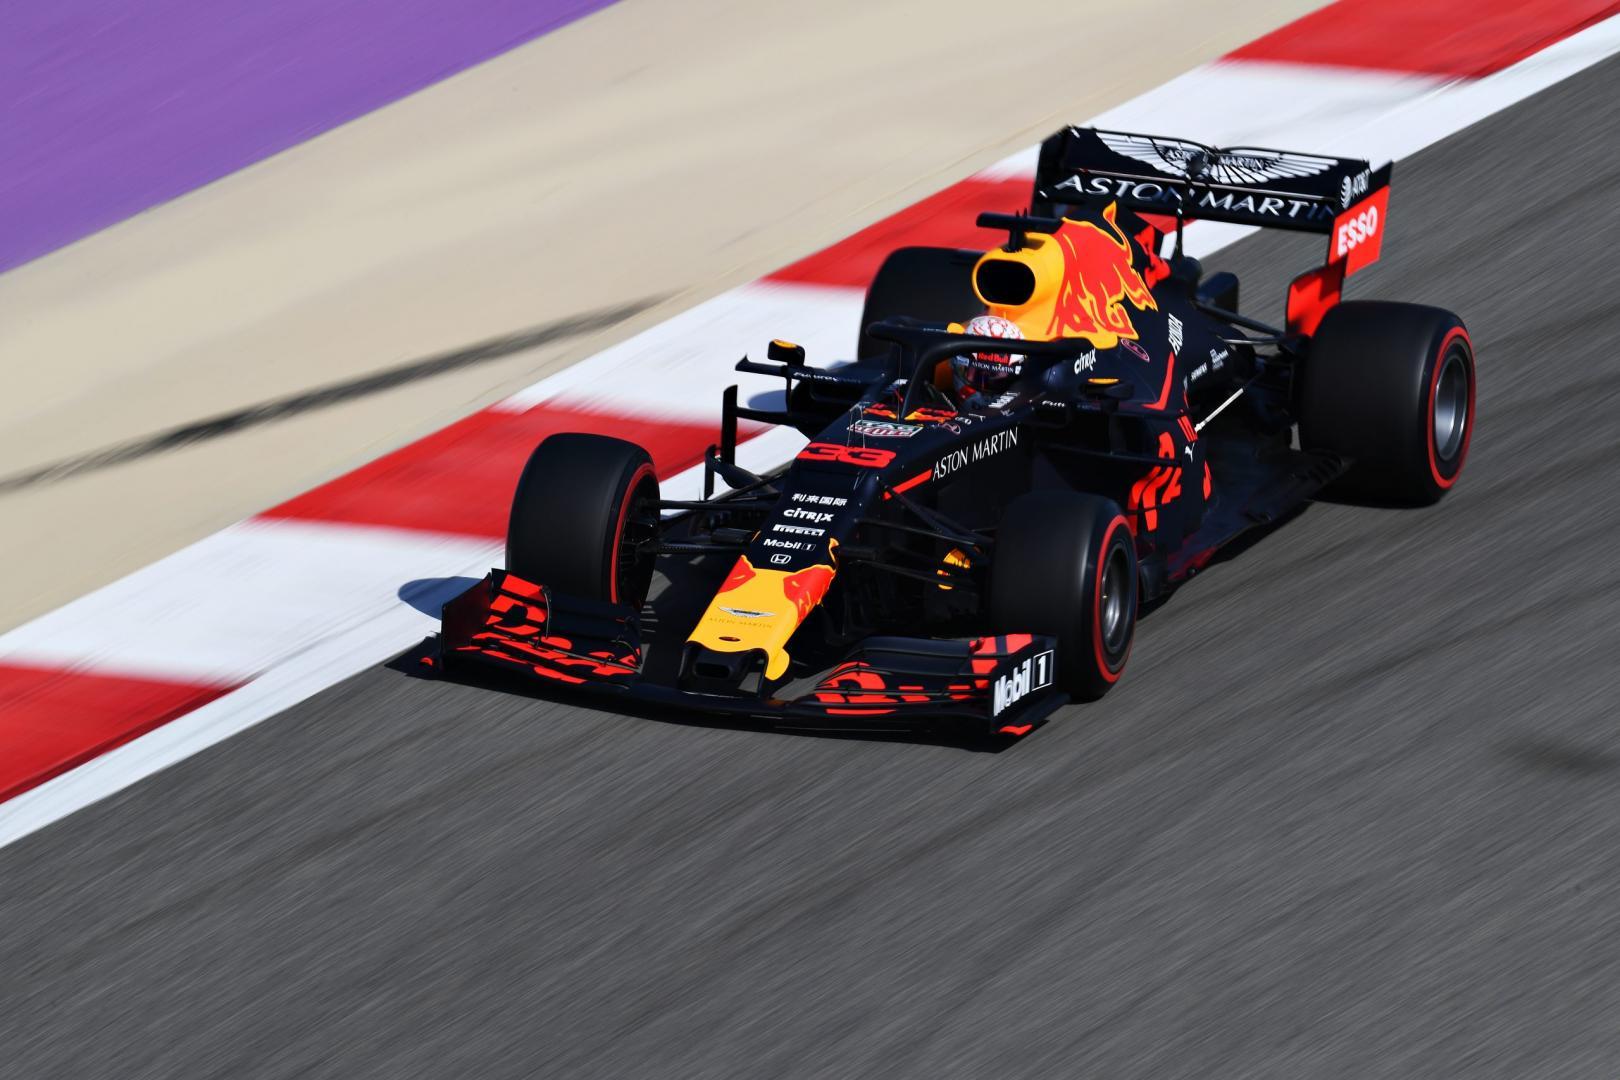 GP van Bahrein 2019 Red Bull RB15